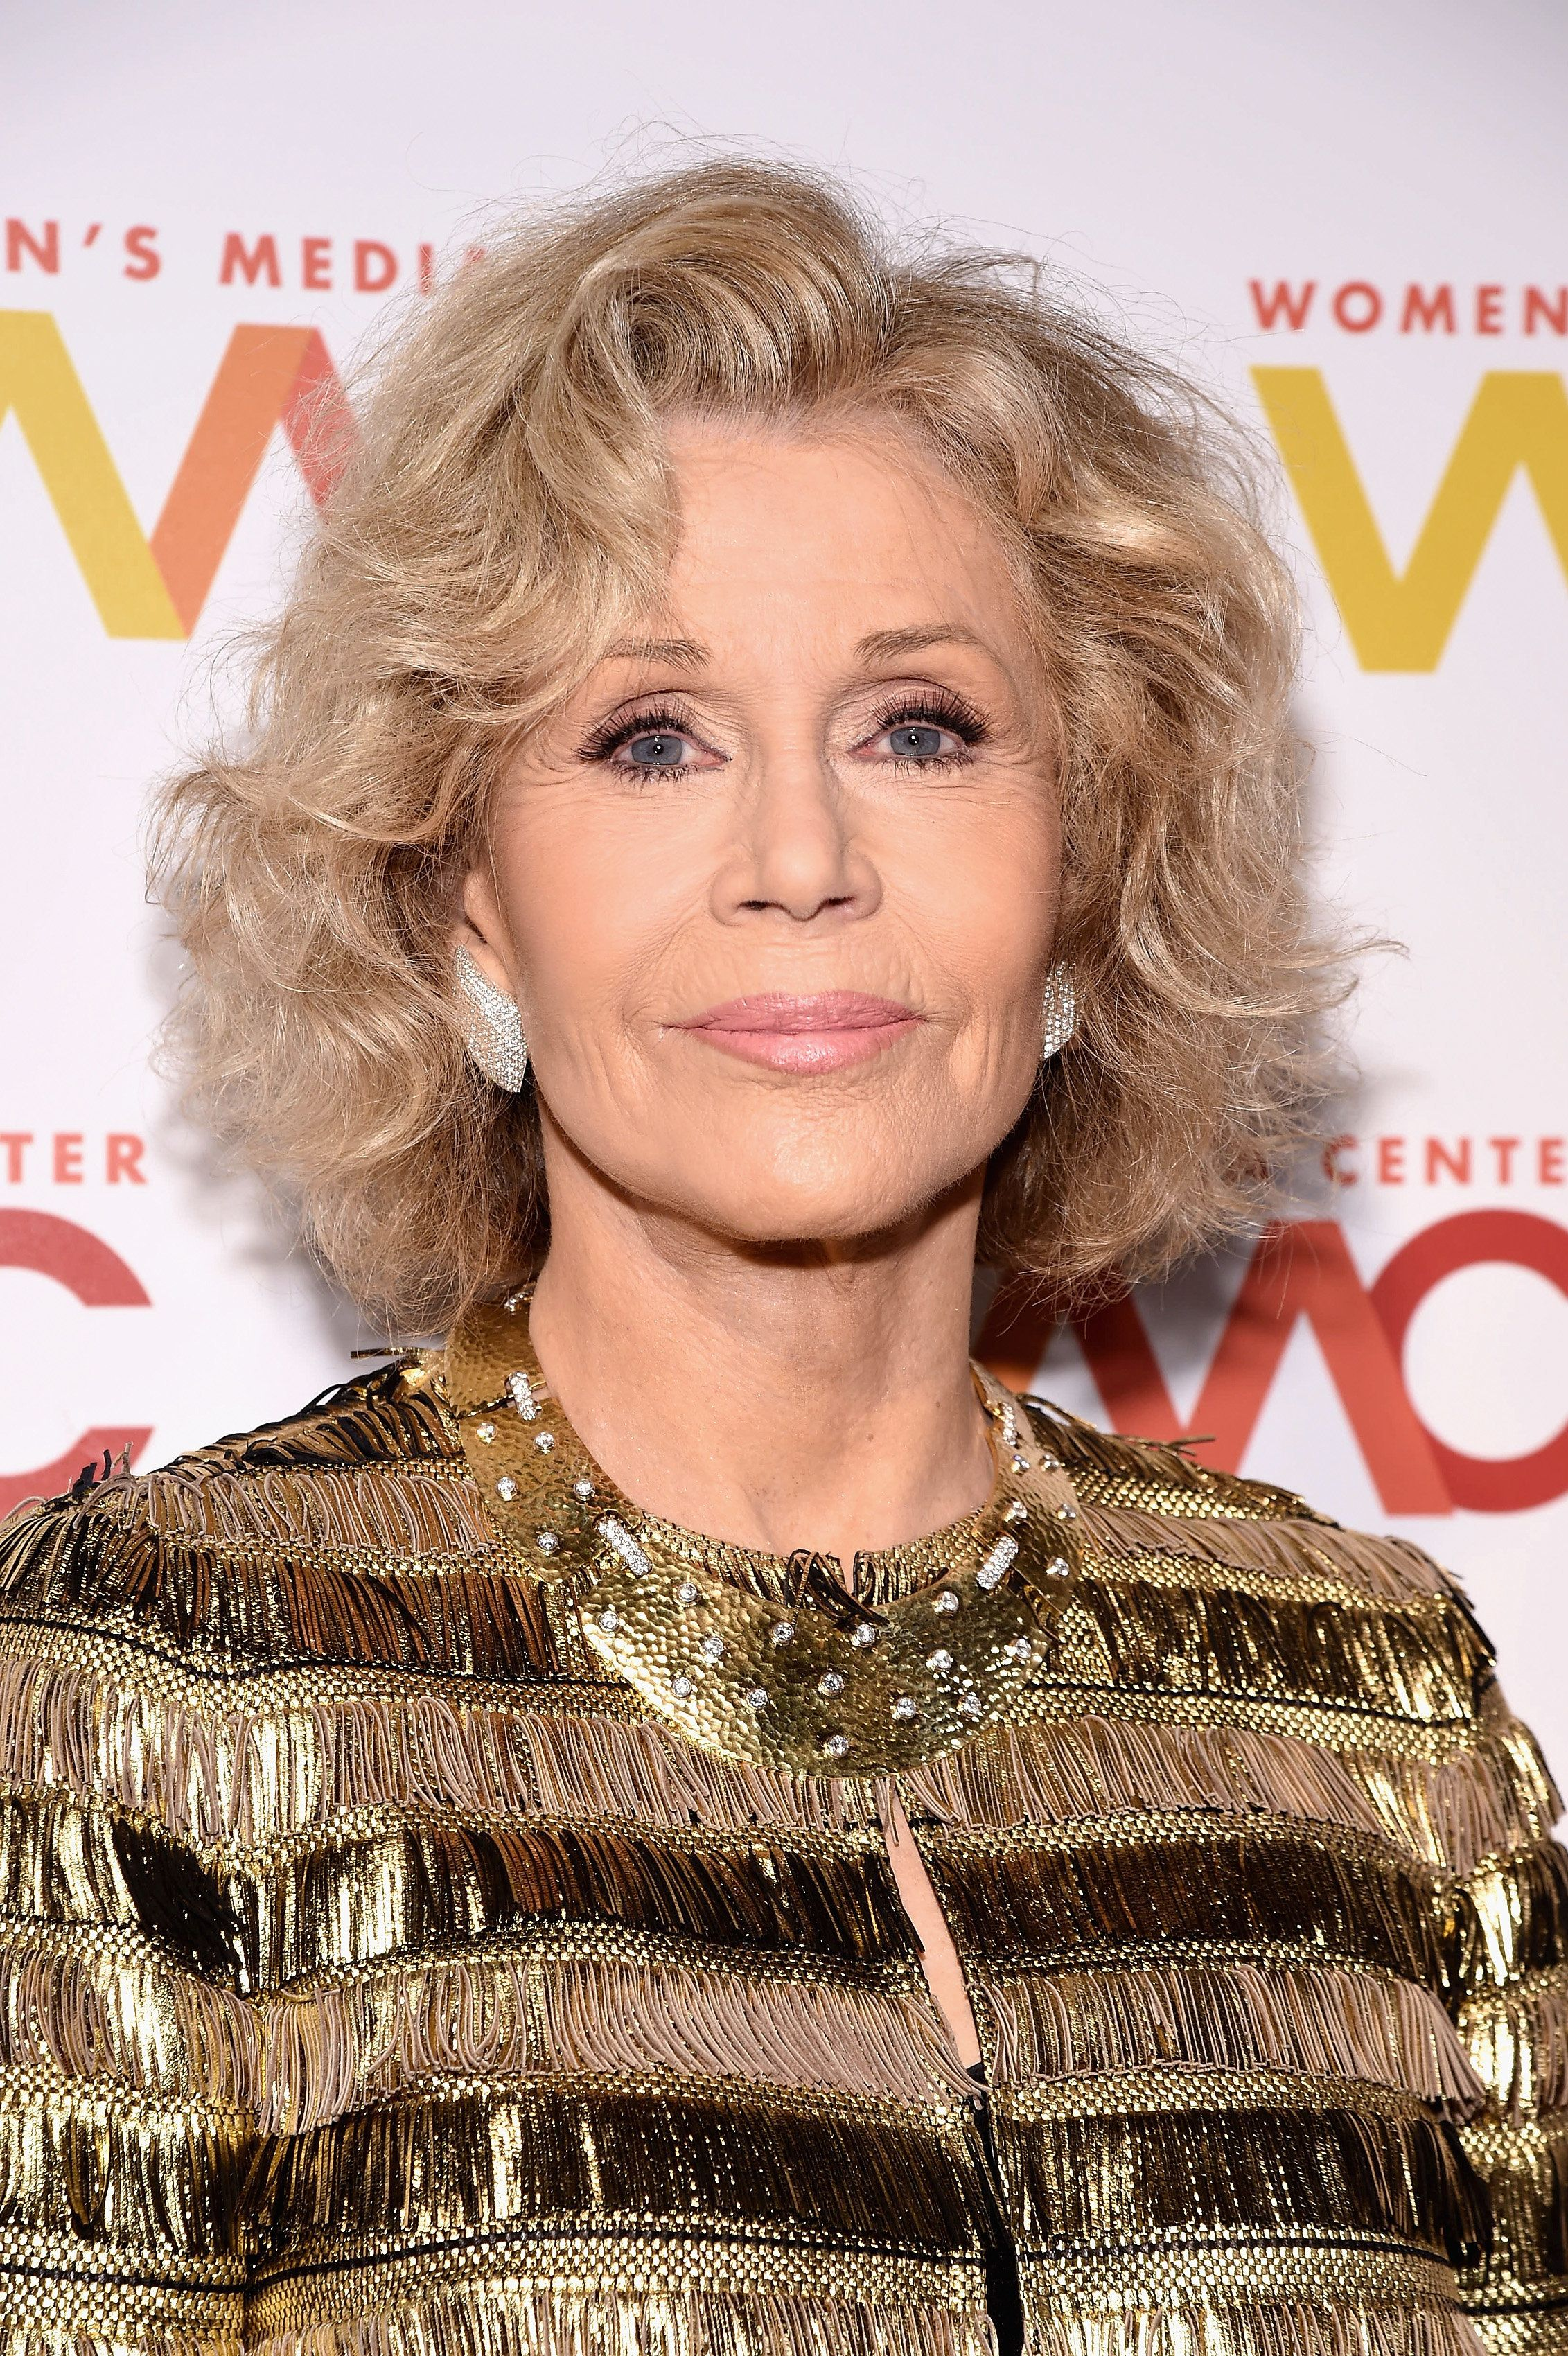 NEW YORK, NY - NOVEMBER 01:  Women's Media Center Co-FounderJane Fonda attends the Women's Media Center 2018 Women's Media Awards at Capitale on November 1, 2018 in New York City.  (Photo by Gary Gershoff/Getty Images)